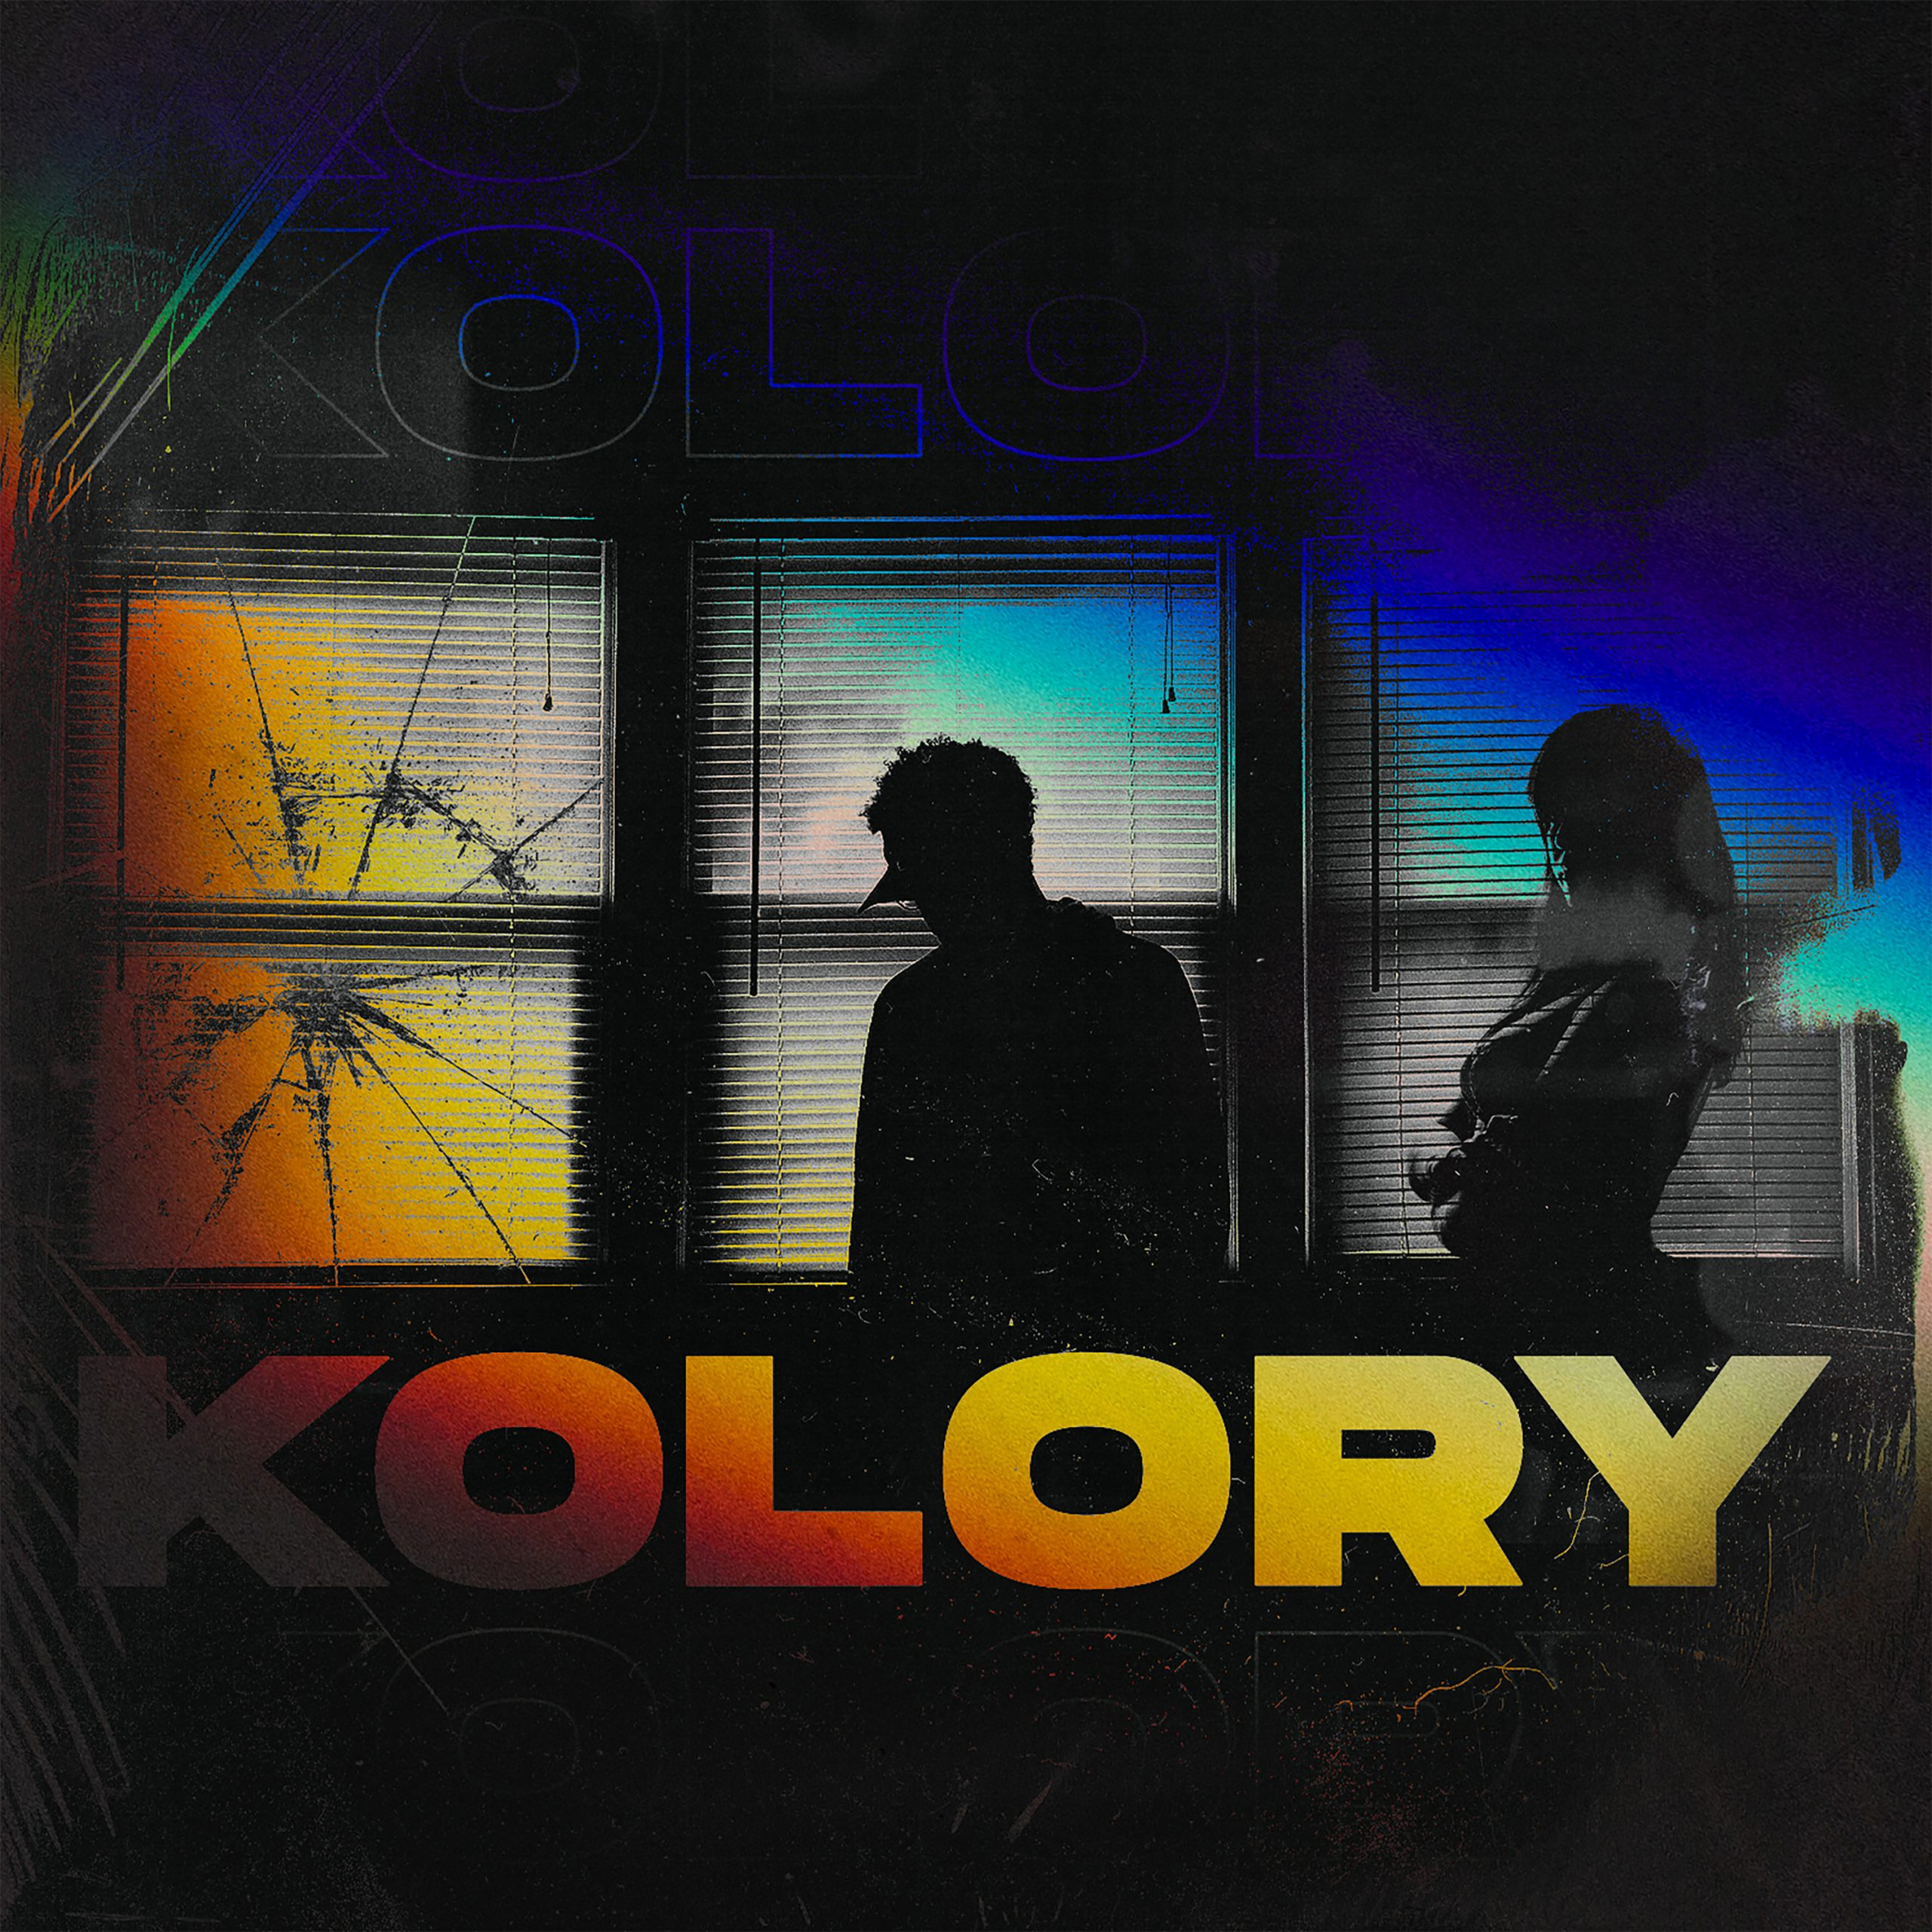 KOLORY_3000px